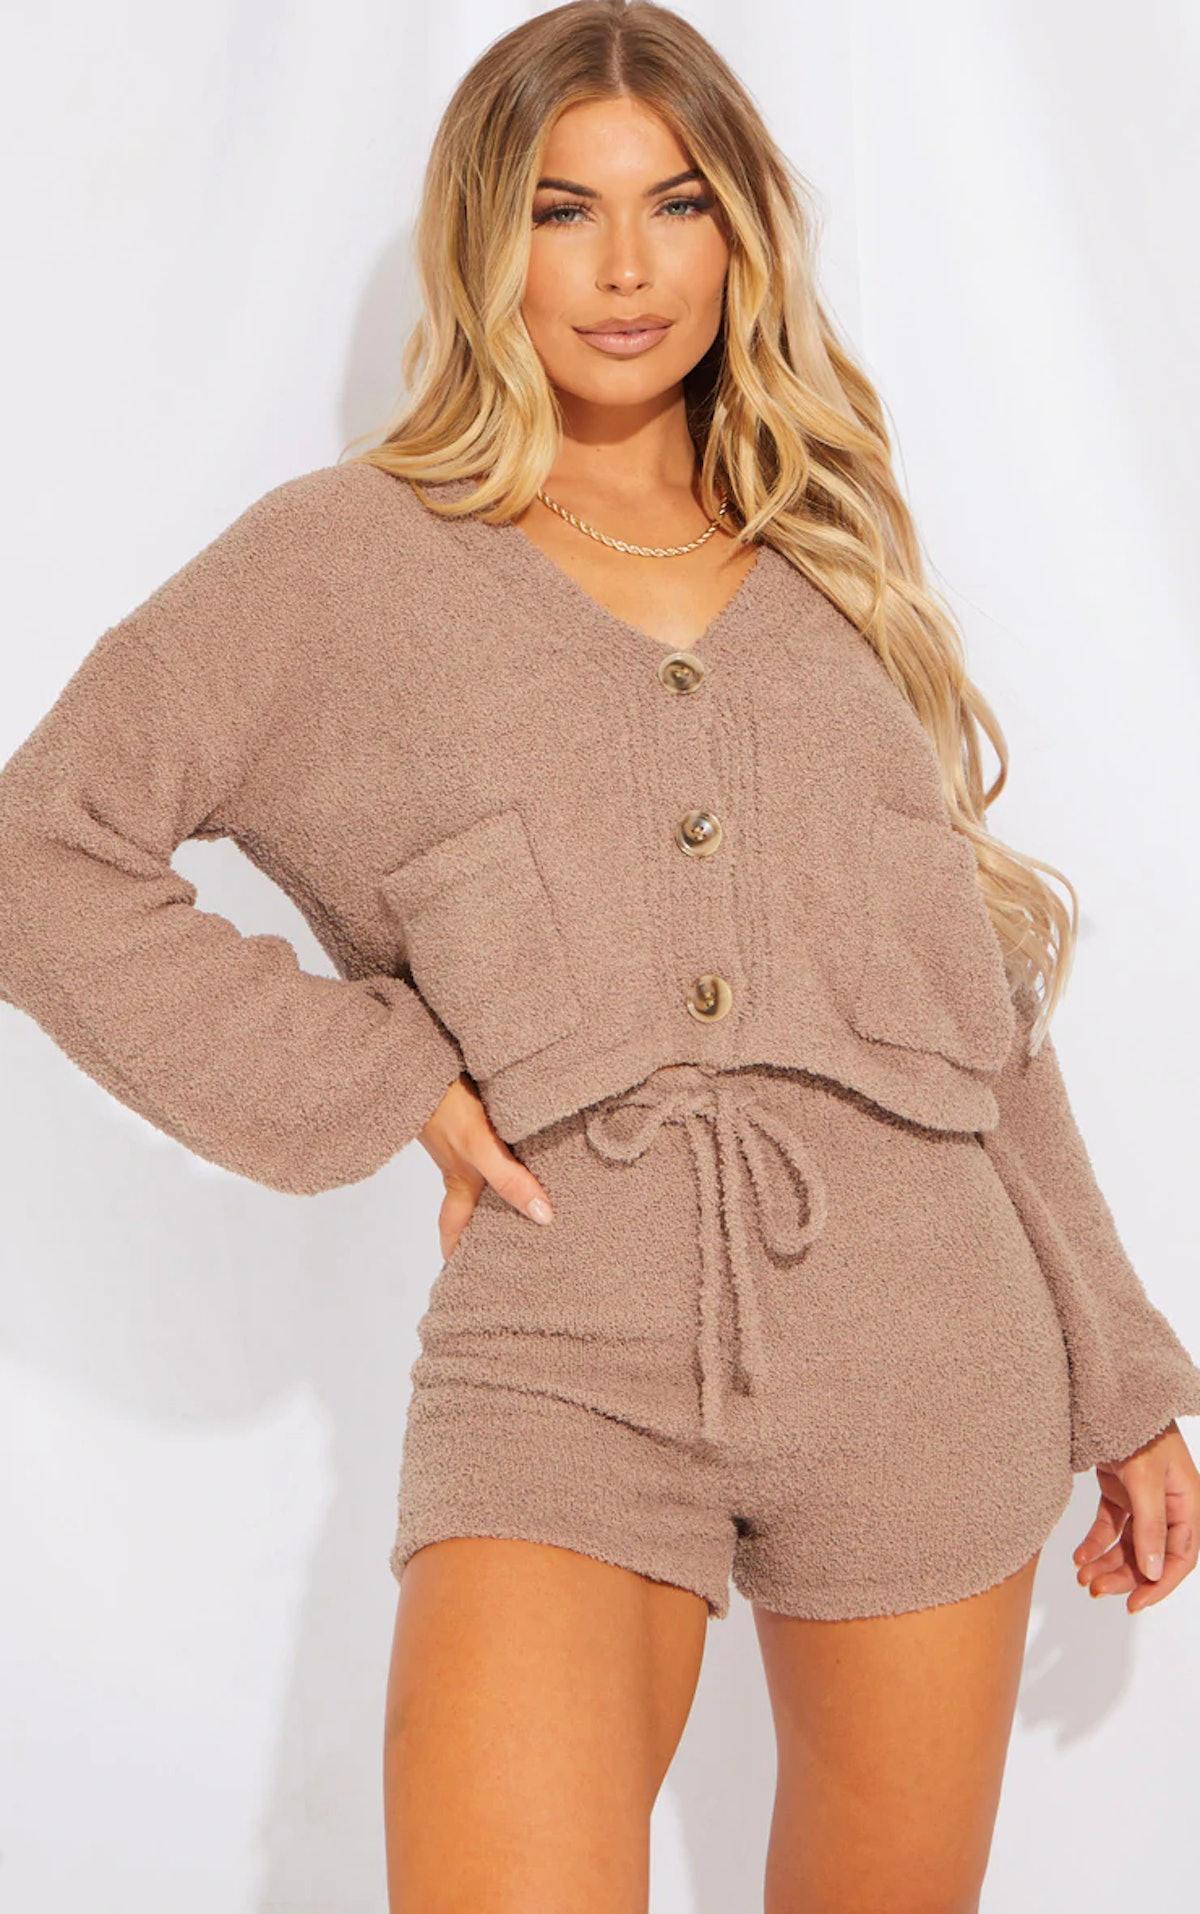 PrettyLittleThing Brown Premium Fluffy Knit Cardigan Shorts Lounge Set